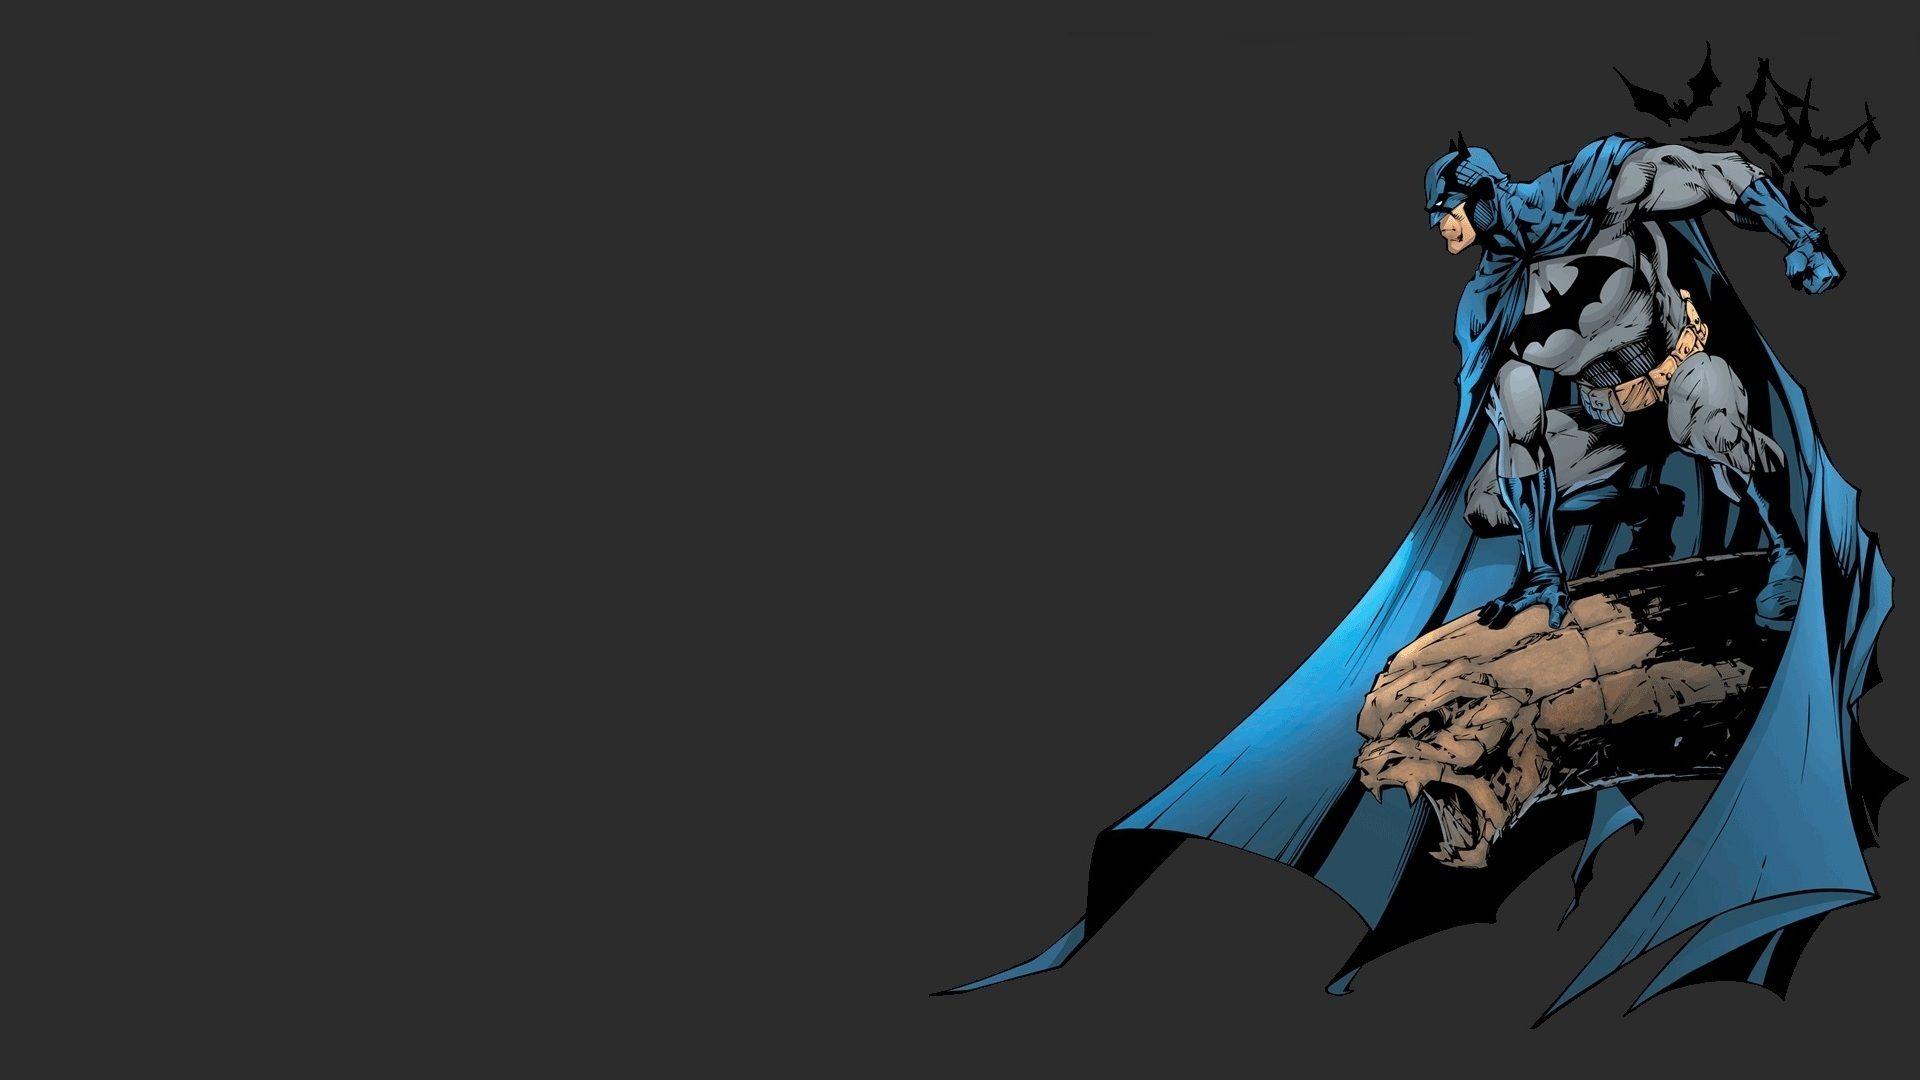 Batman HD Wallpapers Backgrounds Wallpaper 1920x1080